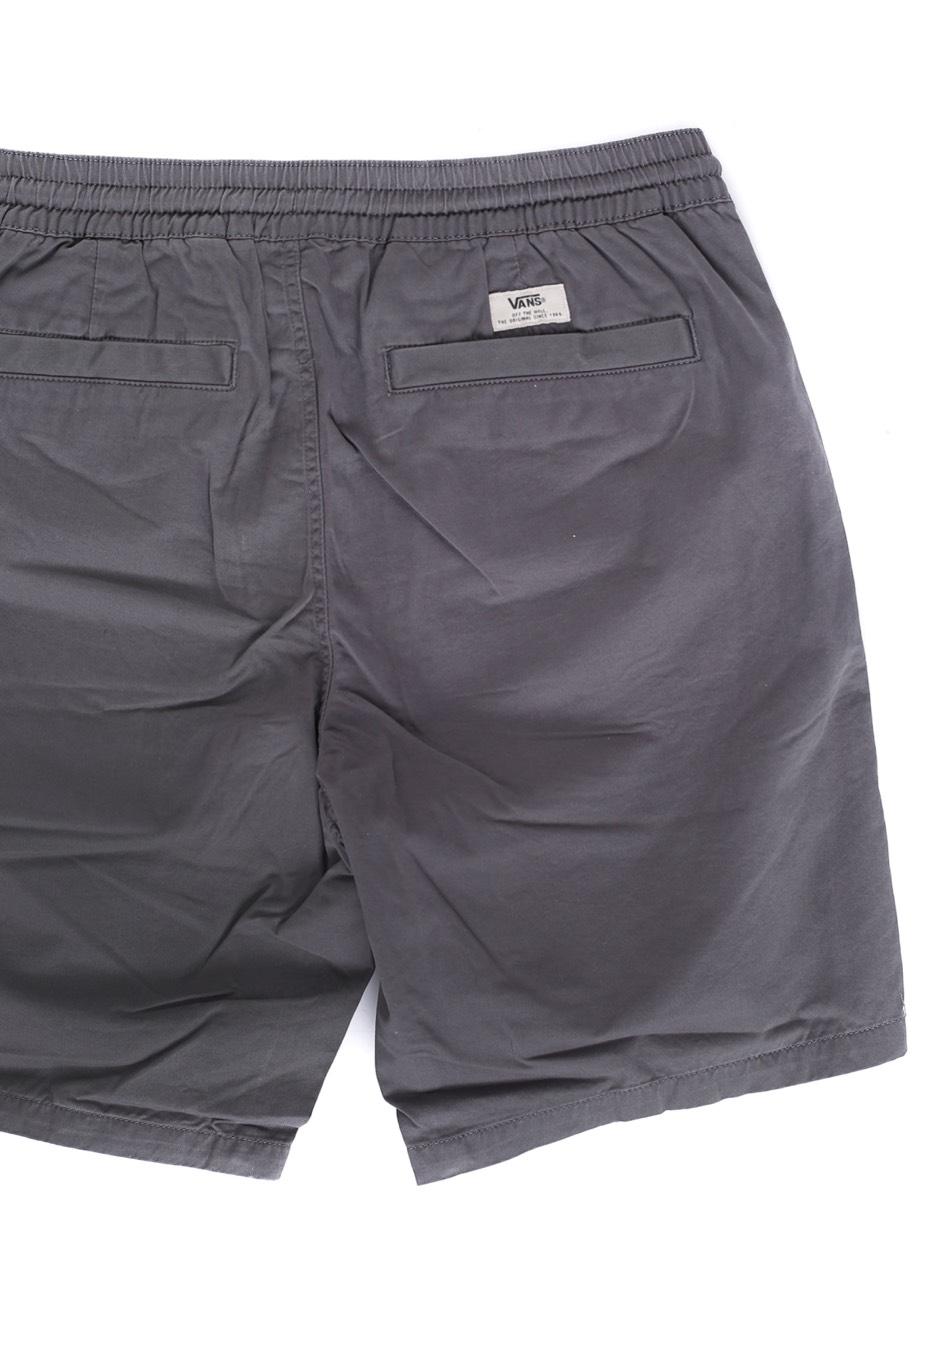 46a2cc6297b04b Vans - Range Gravel - Shorts - Impericon.com FR